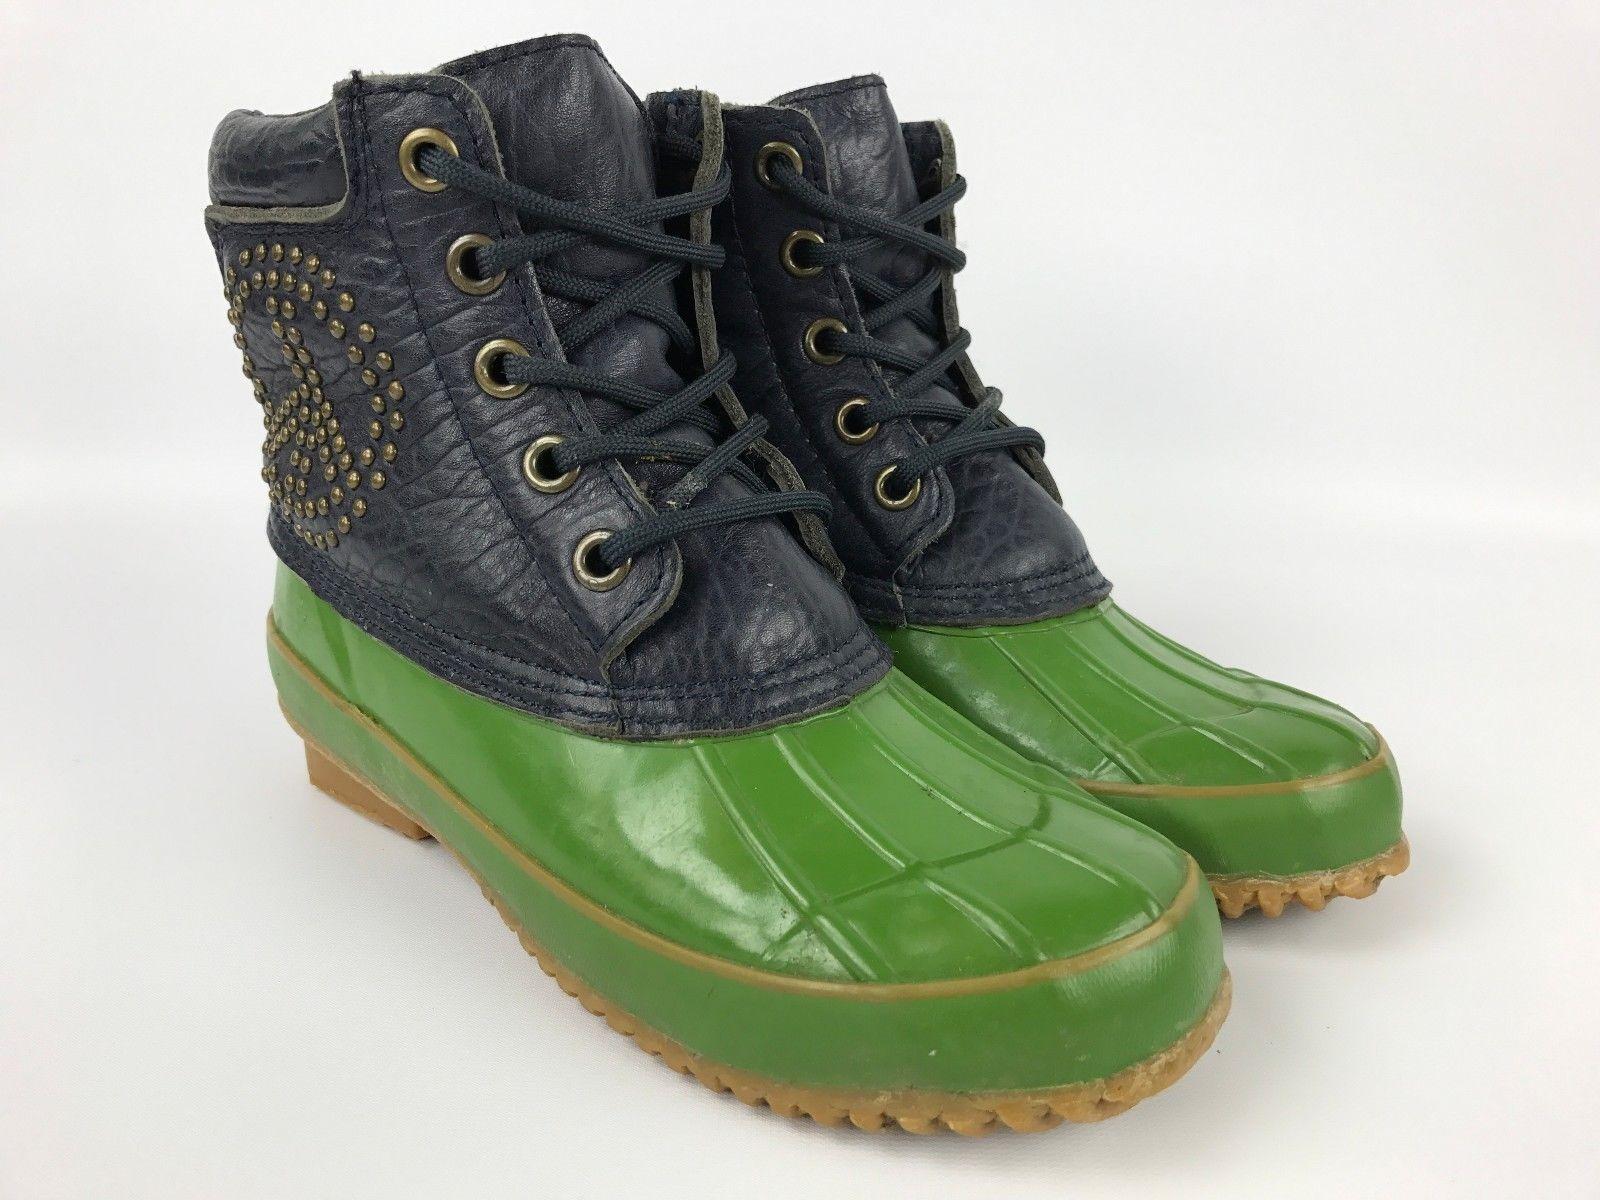 Lucky Brand Daria Navy bleu vert Studded Rain Snow bottes femmes 6 NEW IN BOX